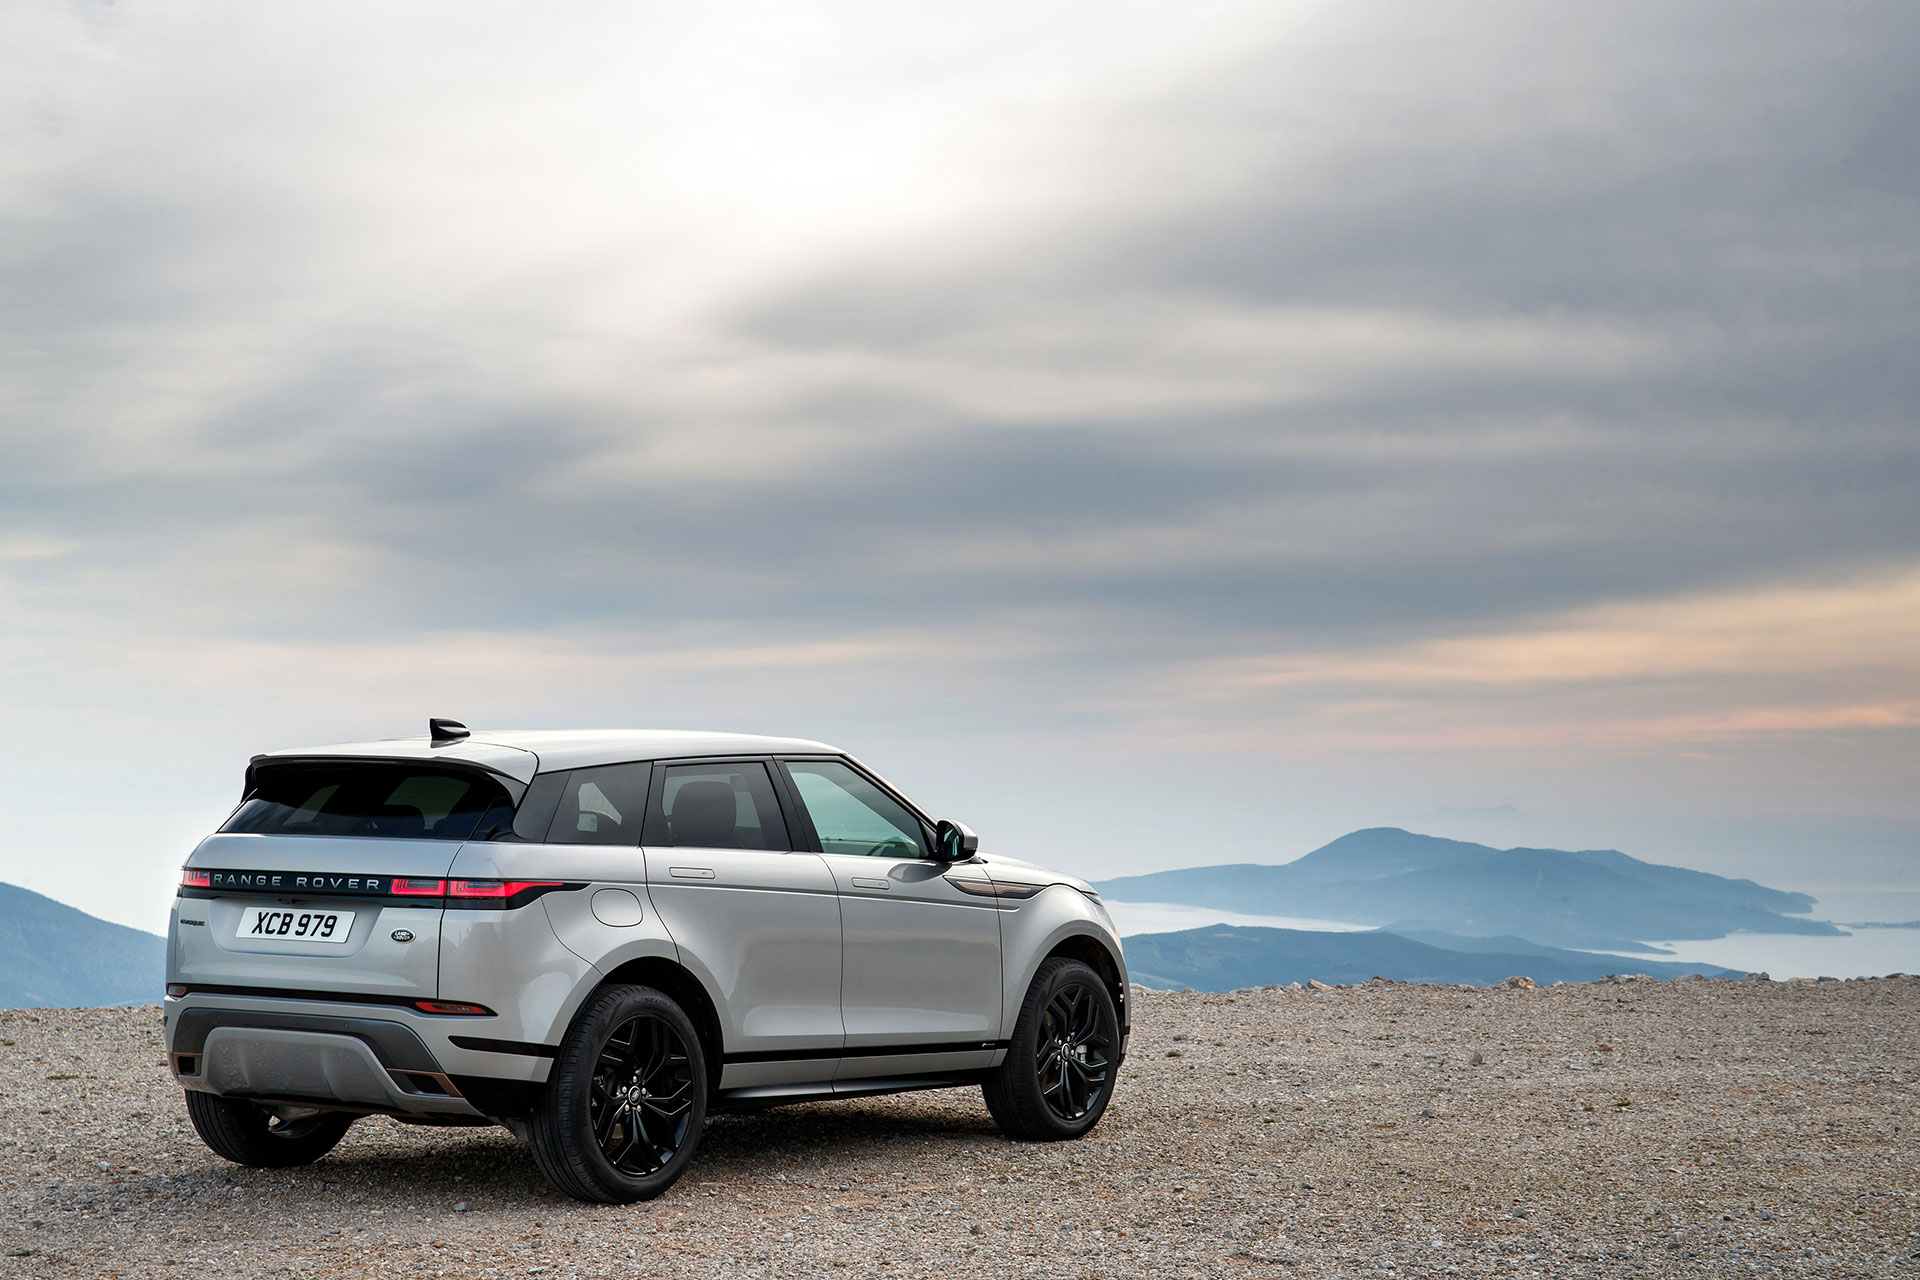 Range Rover Evoque 2019 Gris Exterior 20